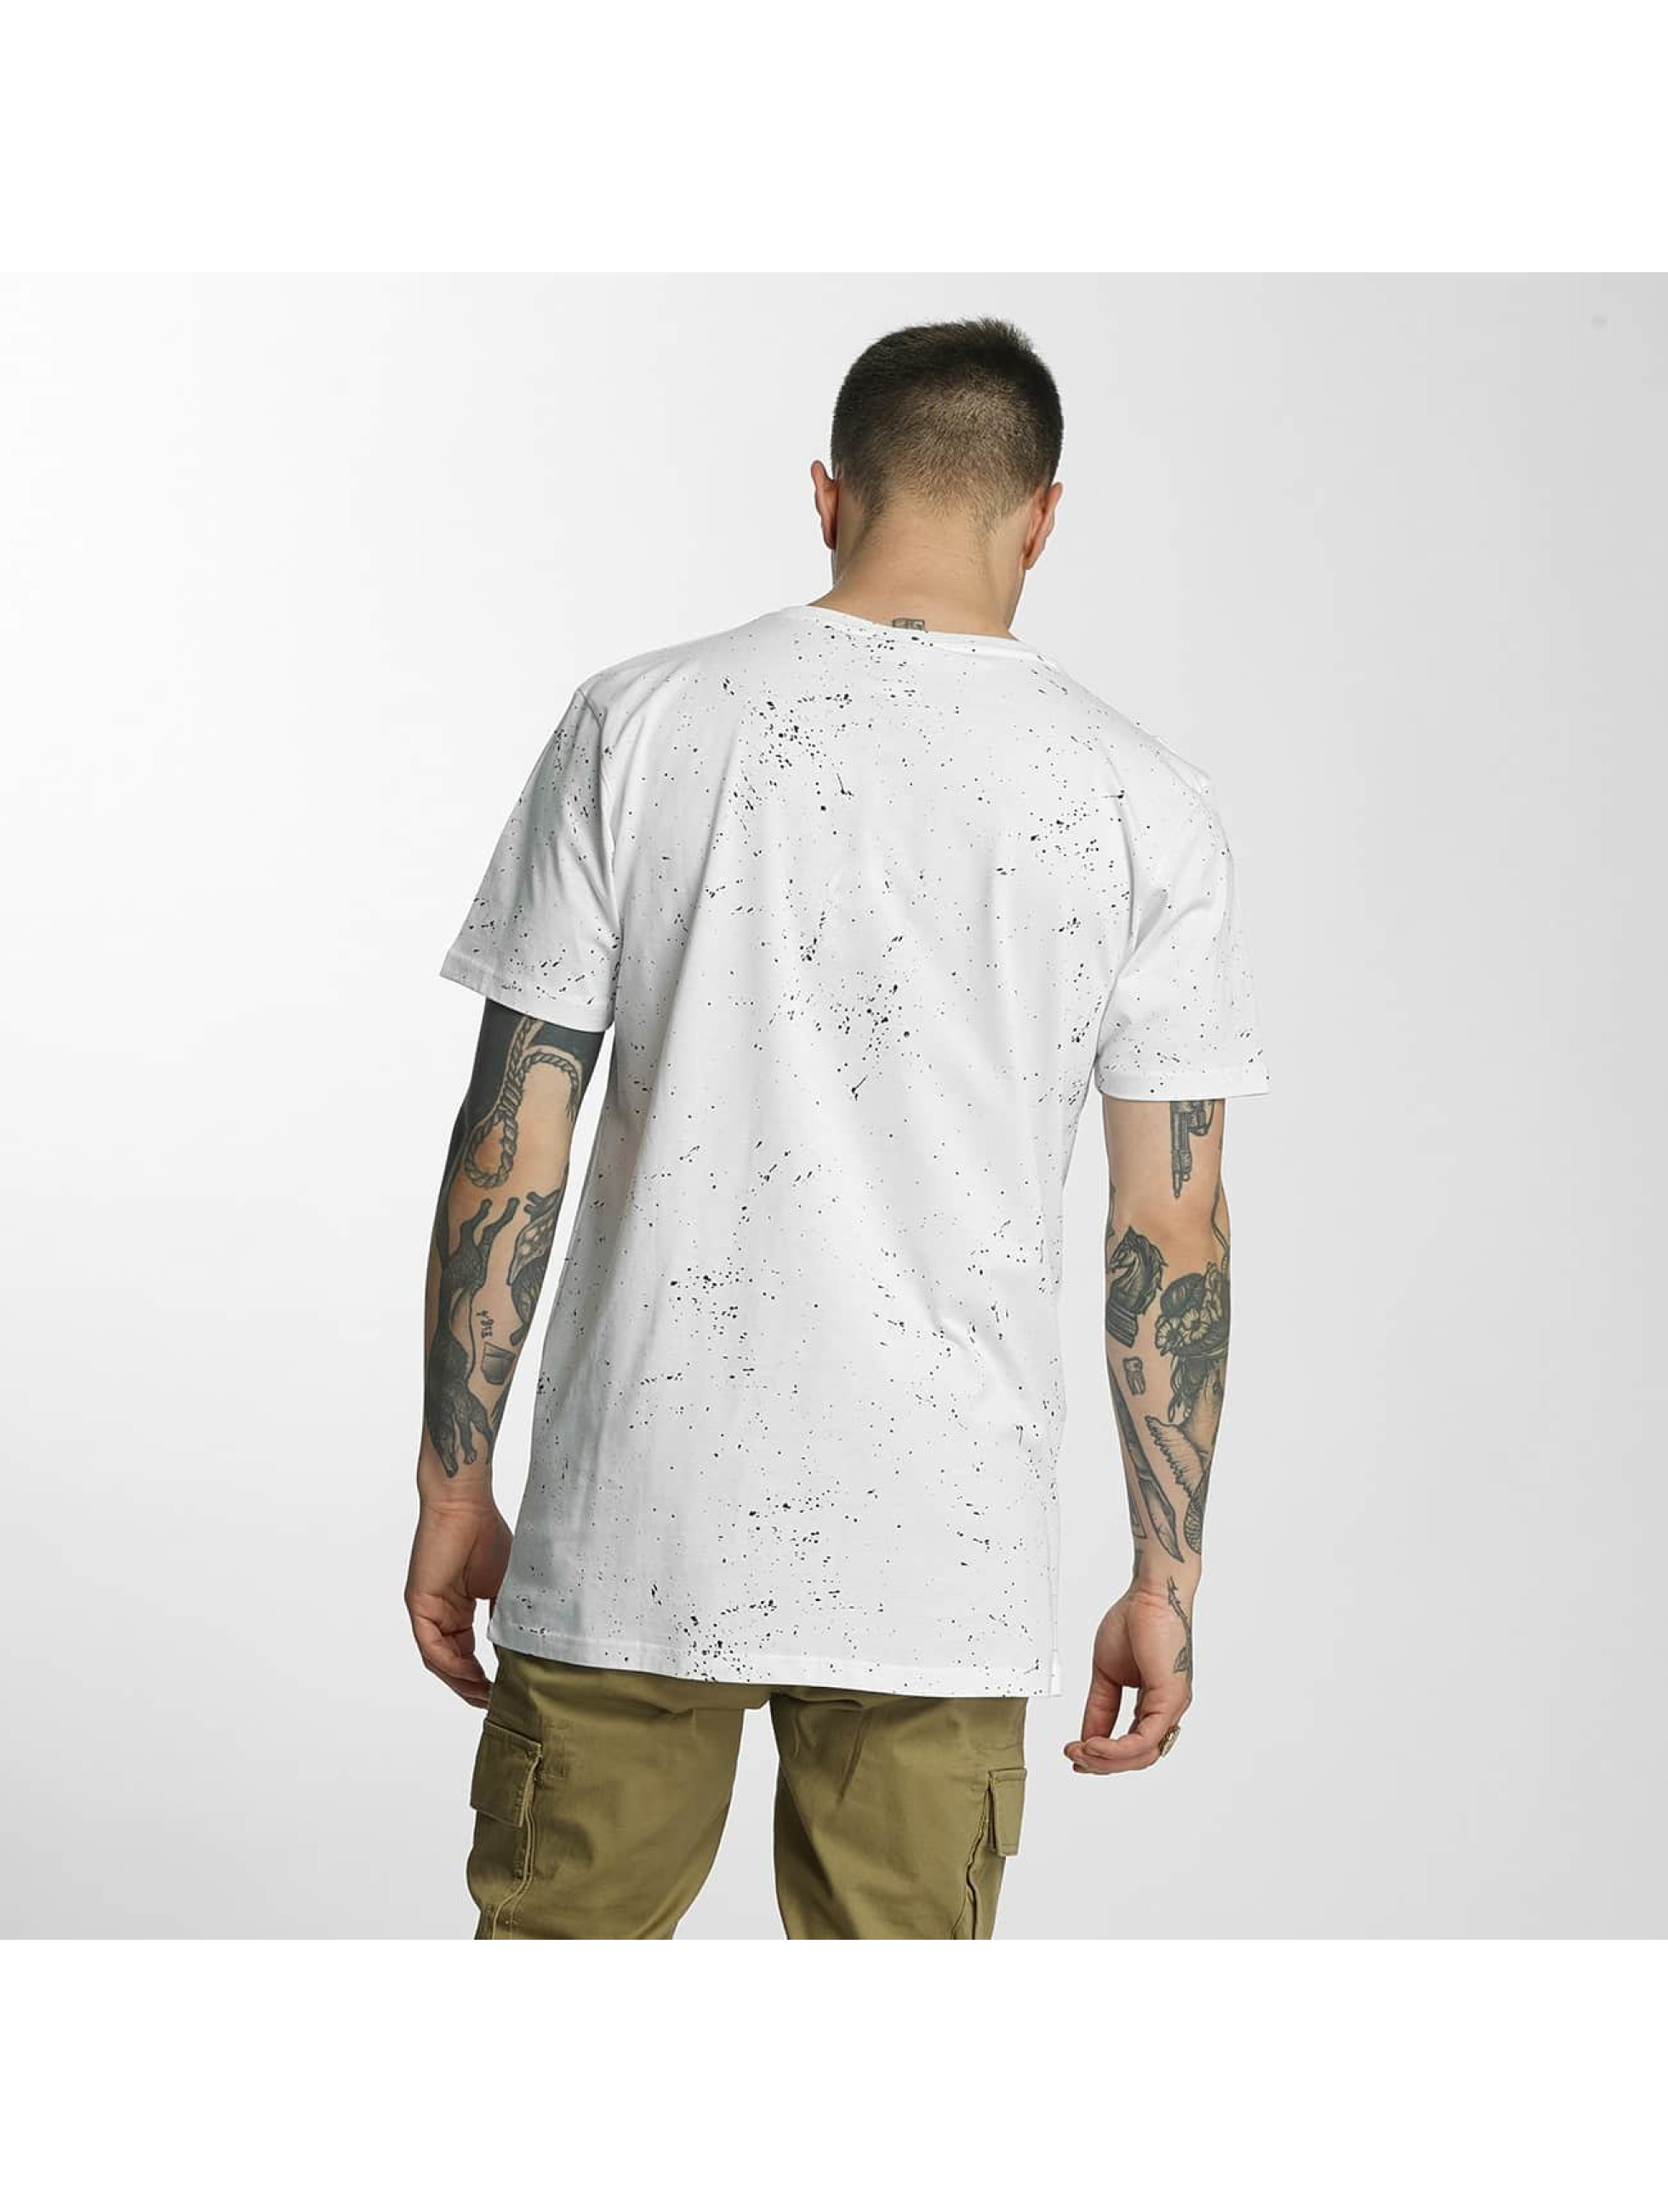 HYPE Camiseta Aop Speckle blanco